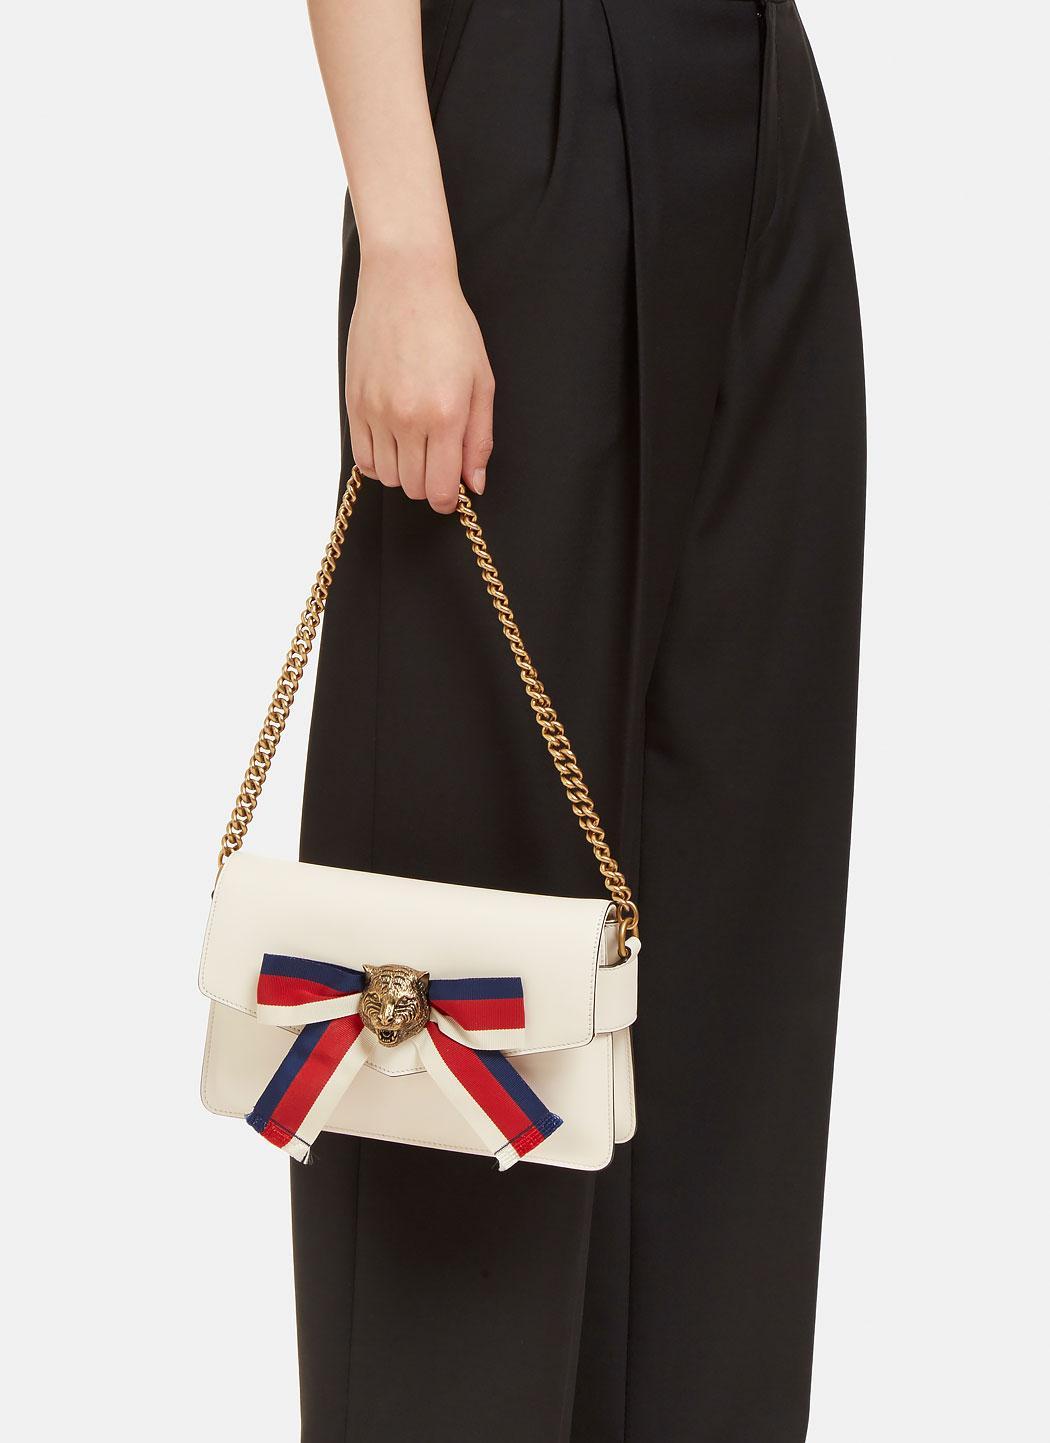 Lyst - Gucci Women s Broadway Tiger Clutch Bag In Ivory 2afc4b32a5fb5